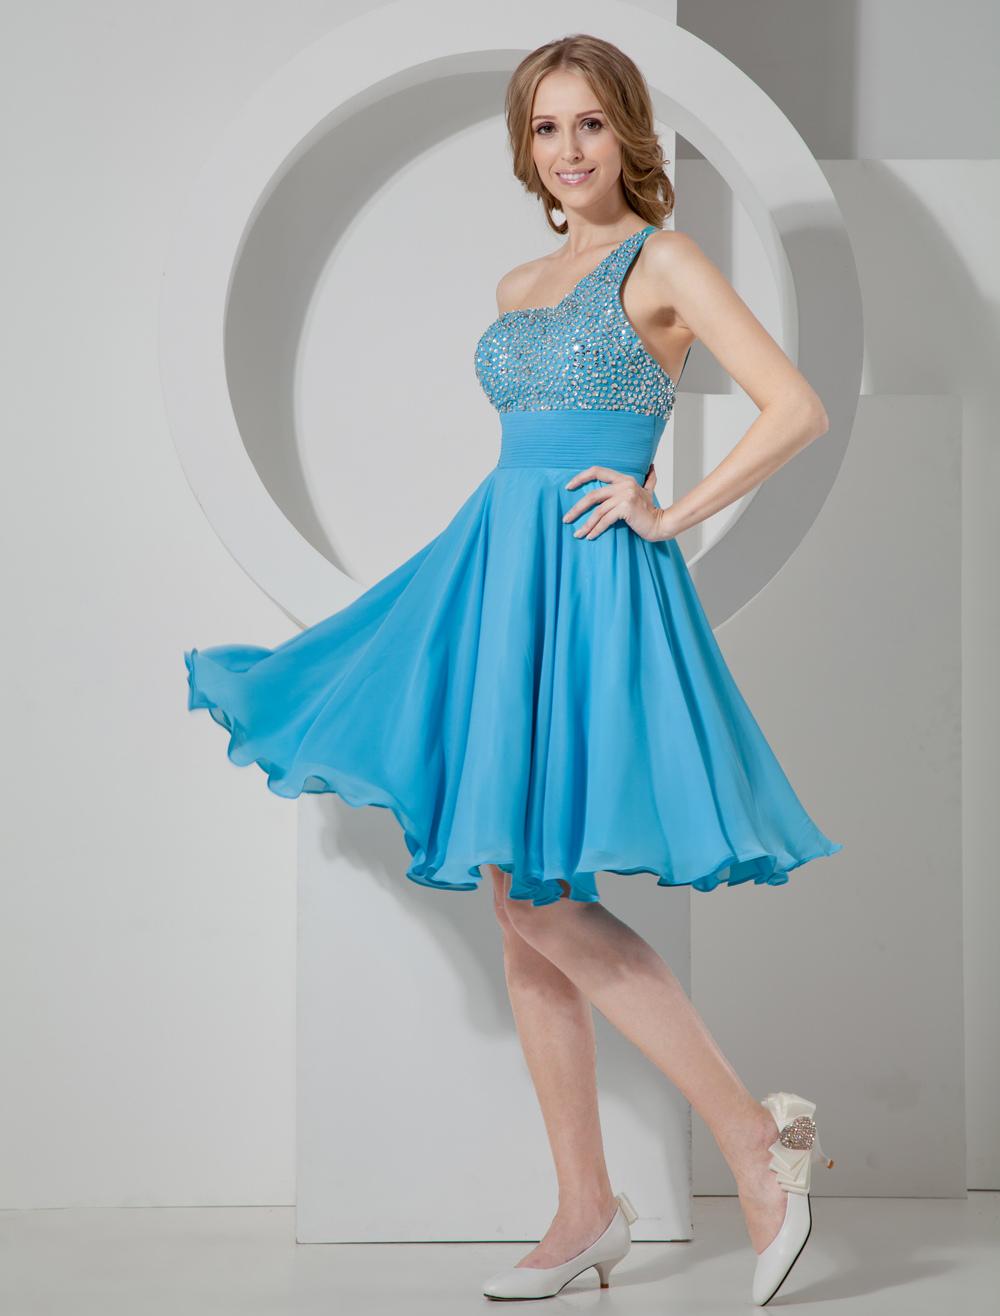 Chiffon Homecoming Dress Cyan Rhinestone One Shoulder Short Party Dress (Wedding Cheap Party Dress) photo